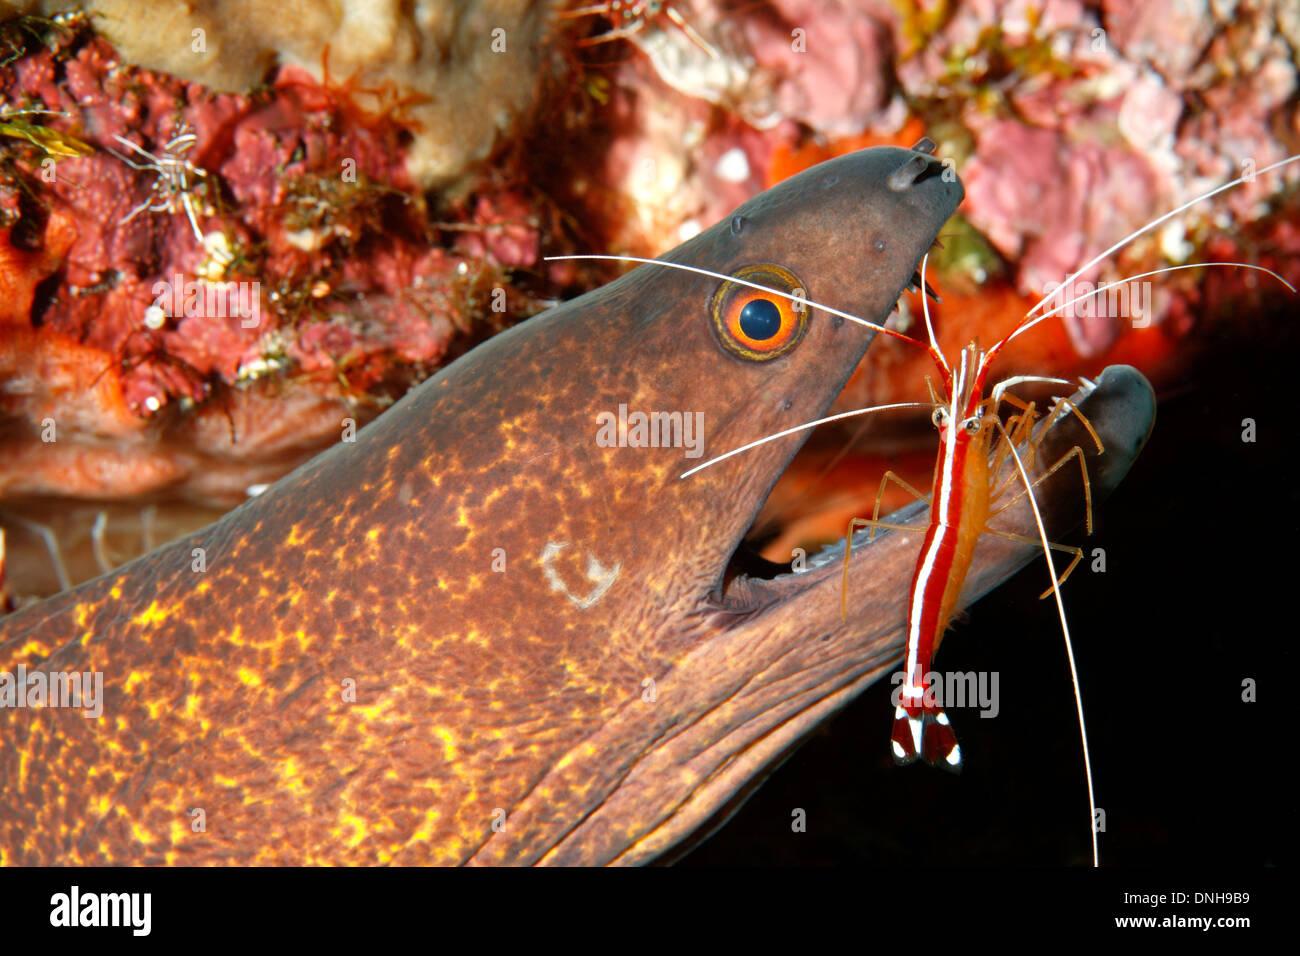 yellowmargin-yellow-margined-moray-eel-g